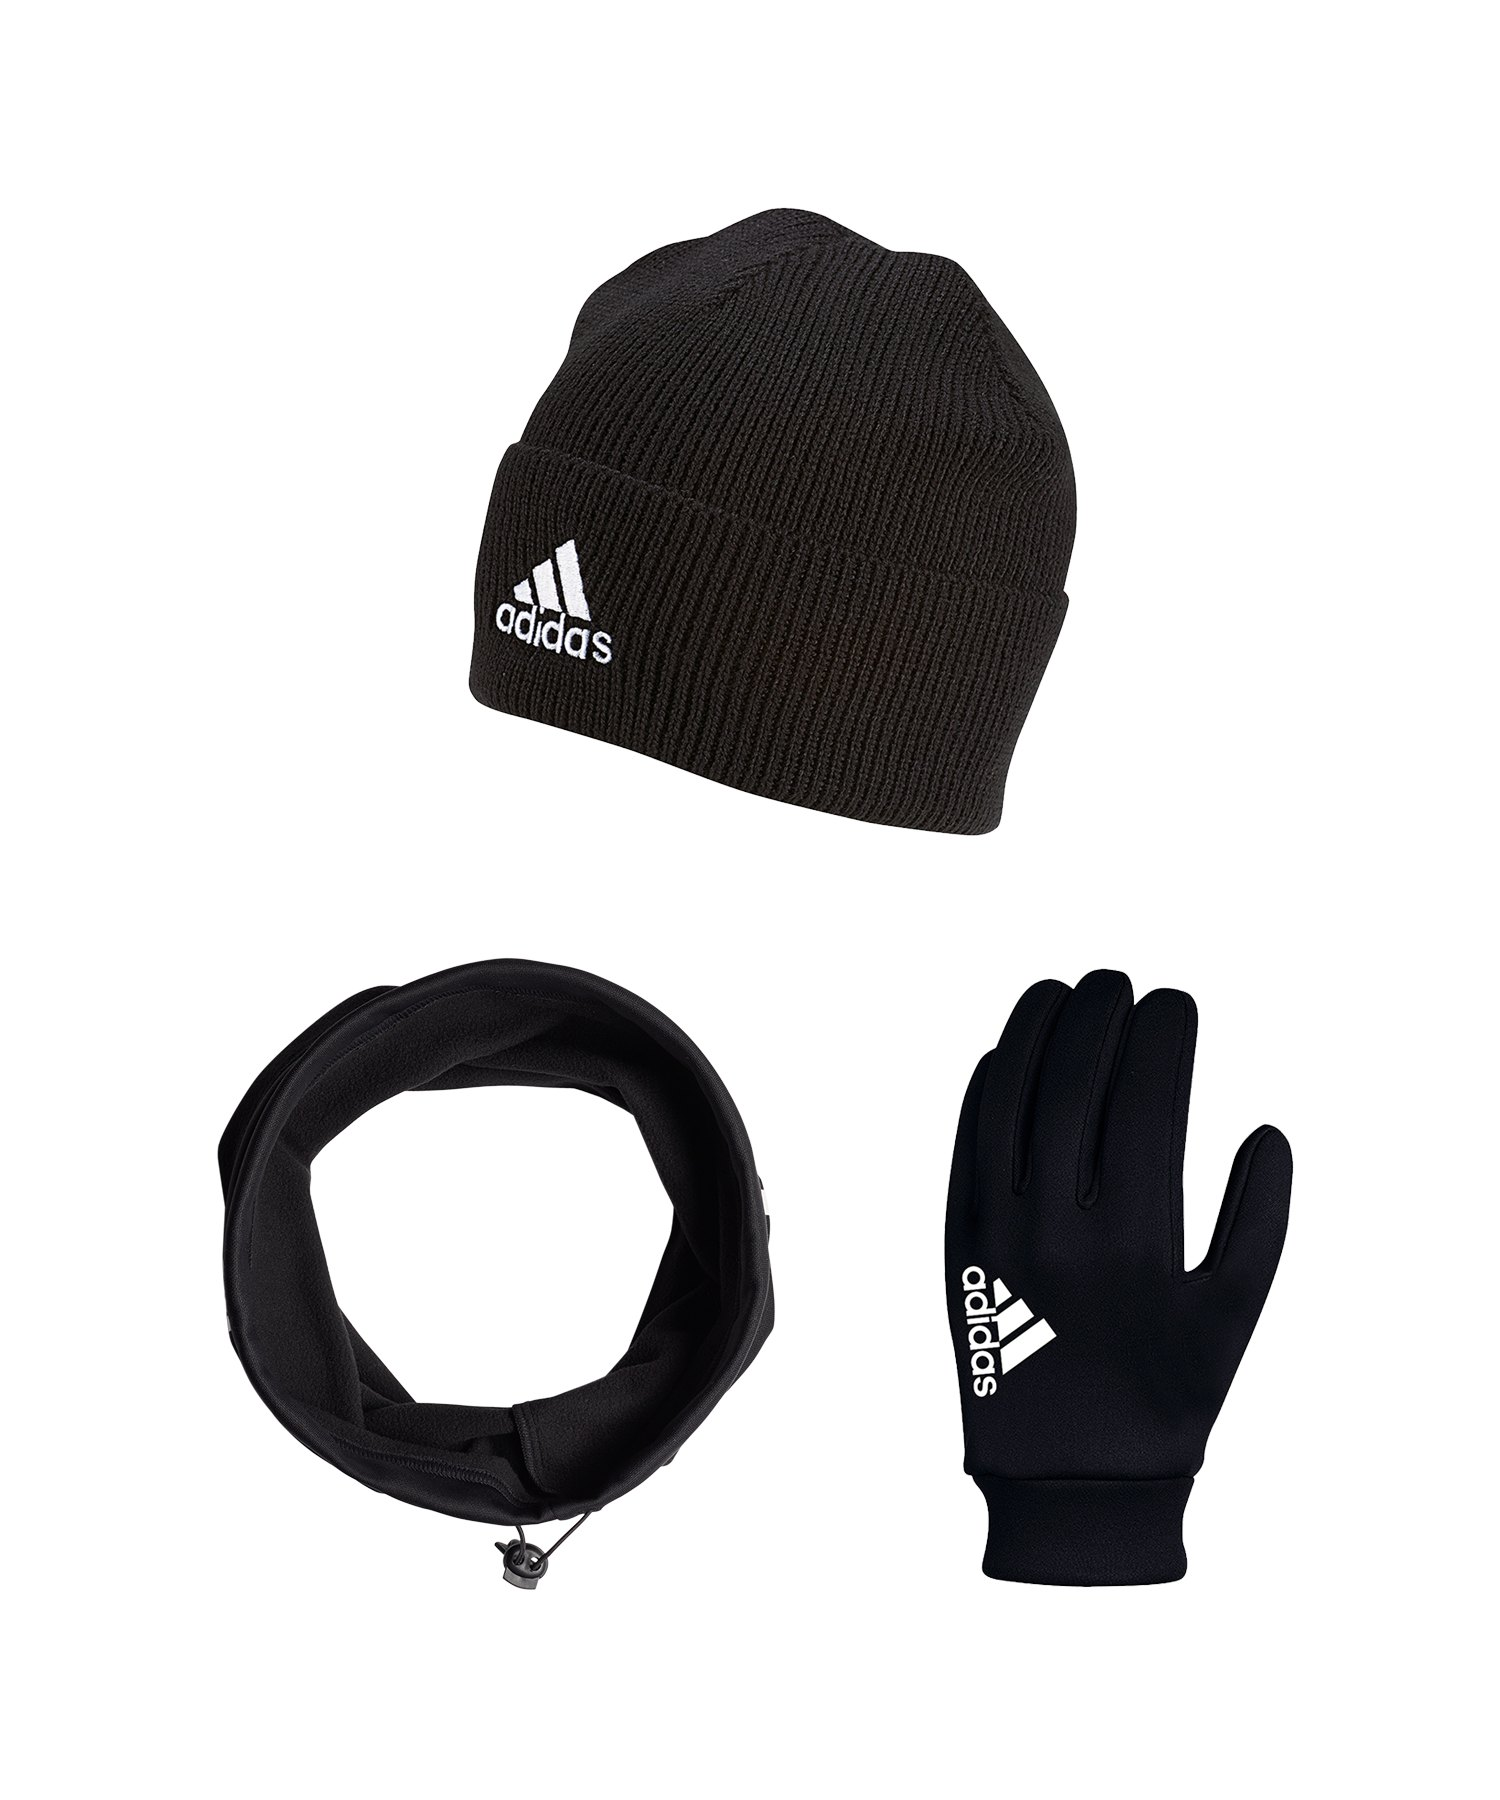 adidas Tiro Clima Proof 3er Winter Set Schwarz - schwarz